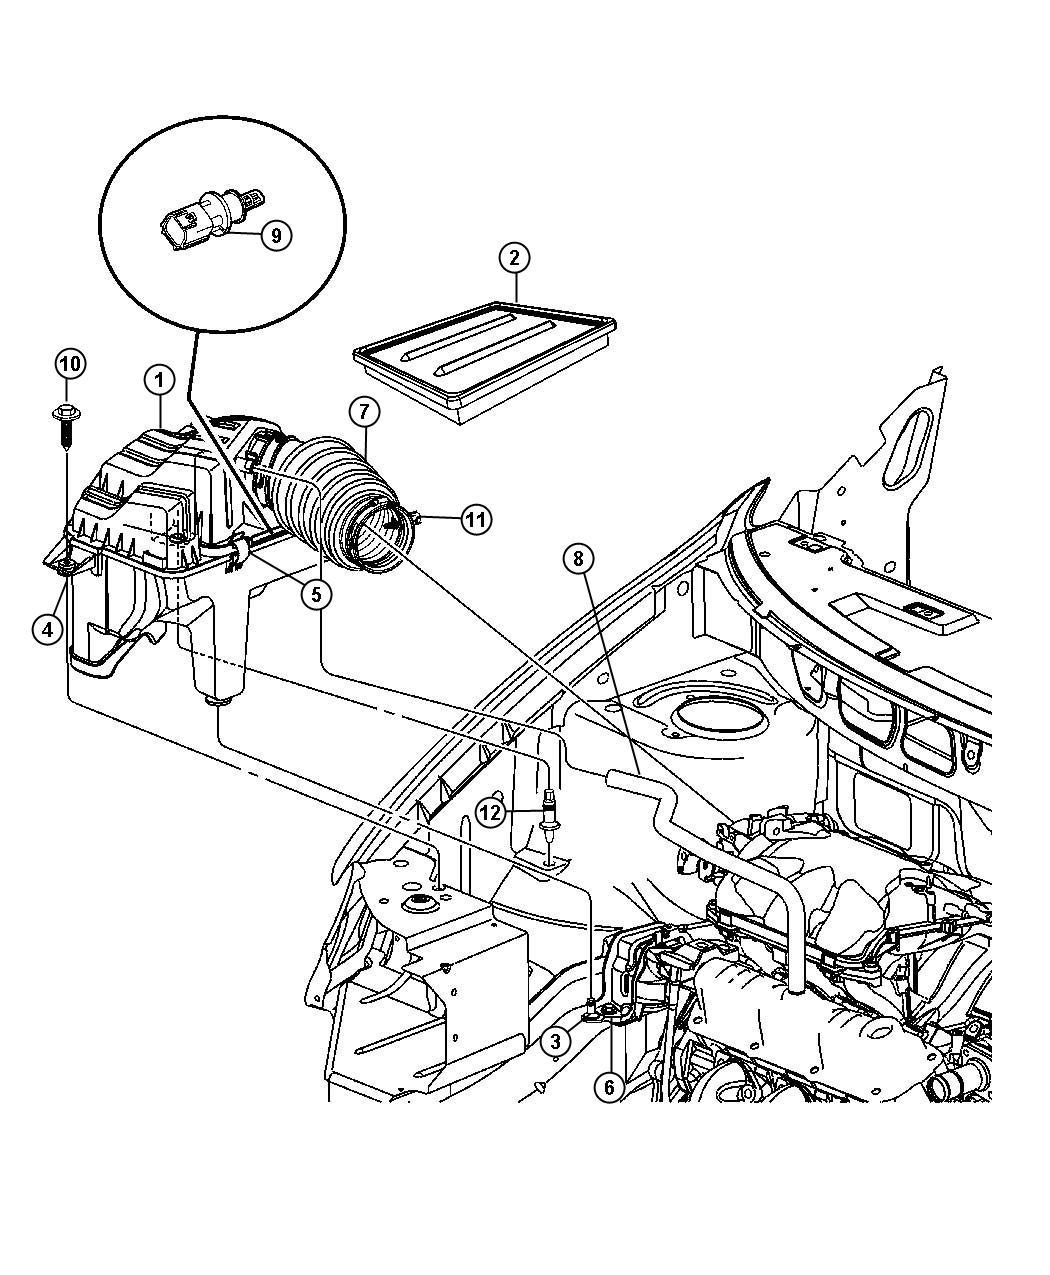 Chrysler Town & Country Hose. Pcv valve to intake manifold